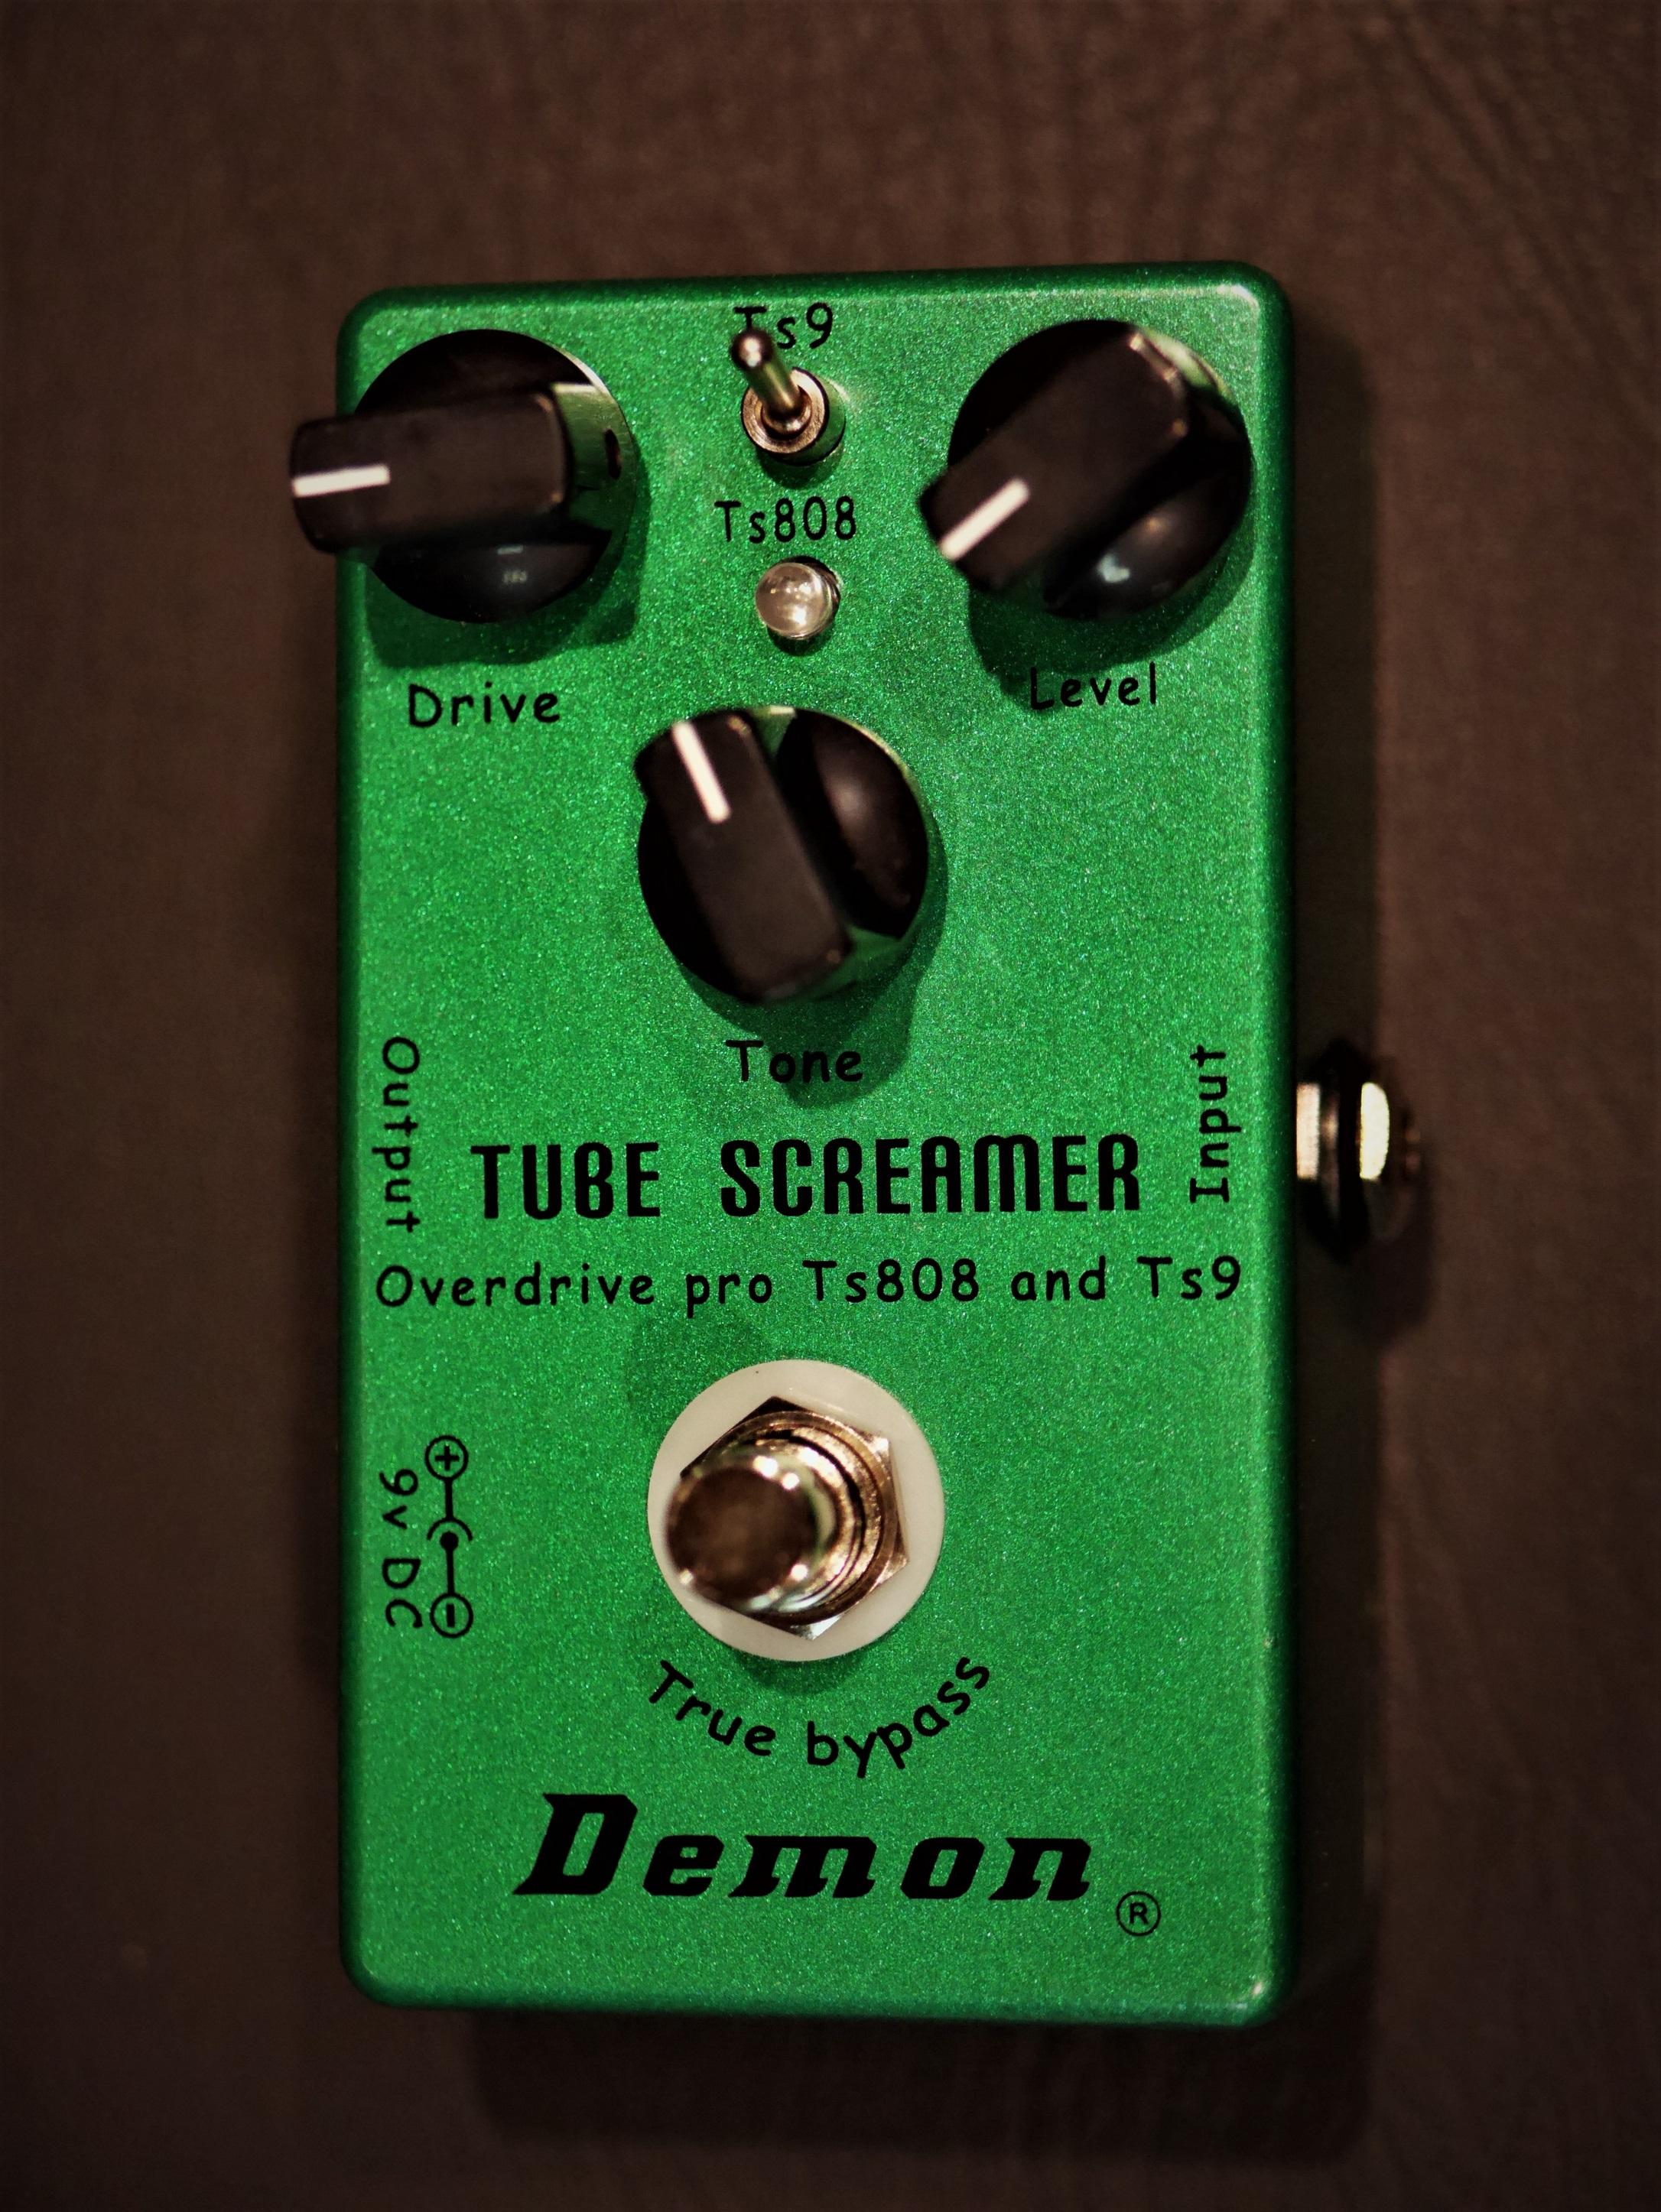 studio la boite a meuh - Demon tube screamer